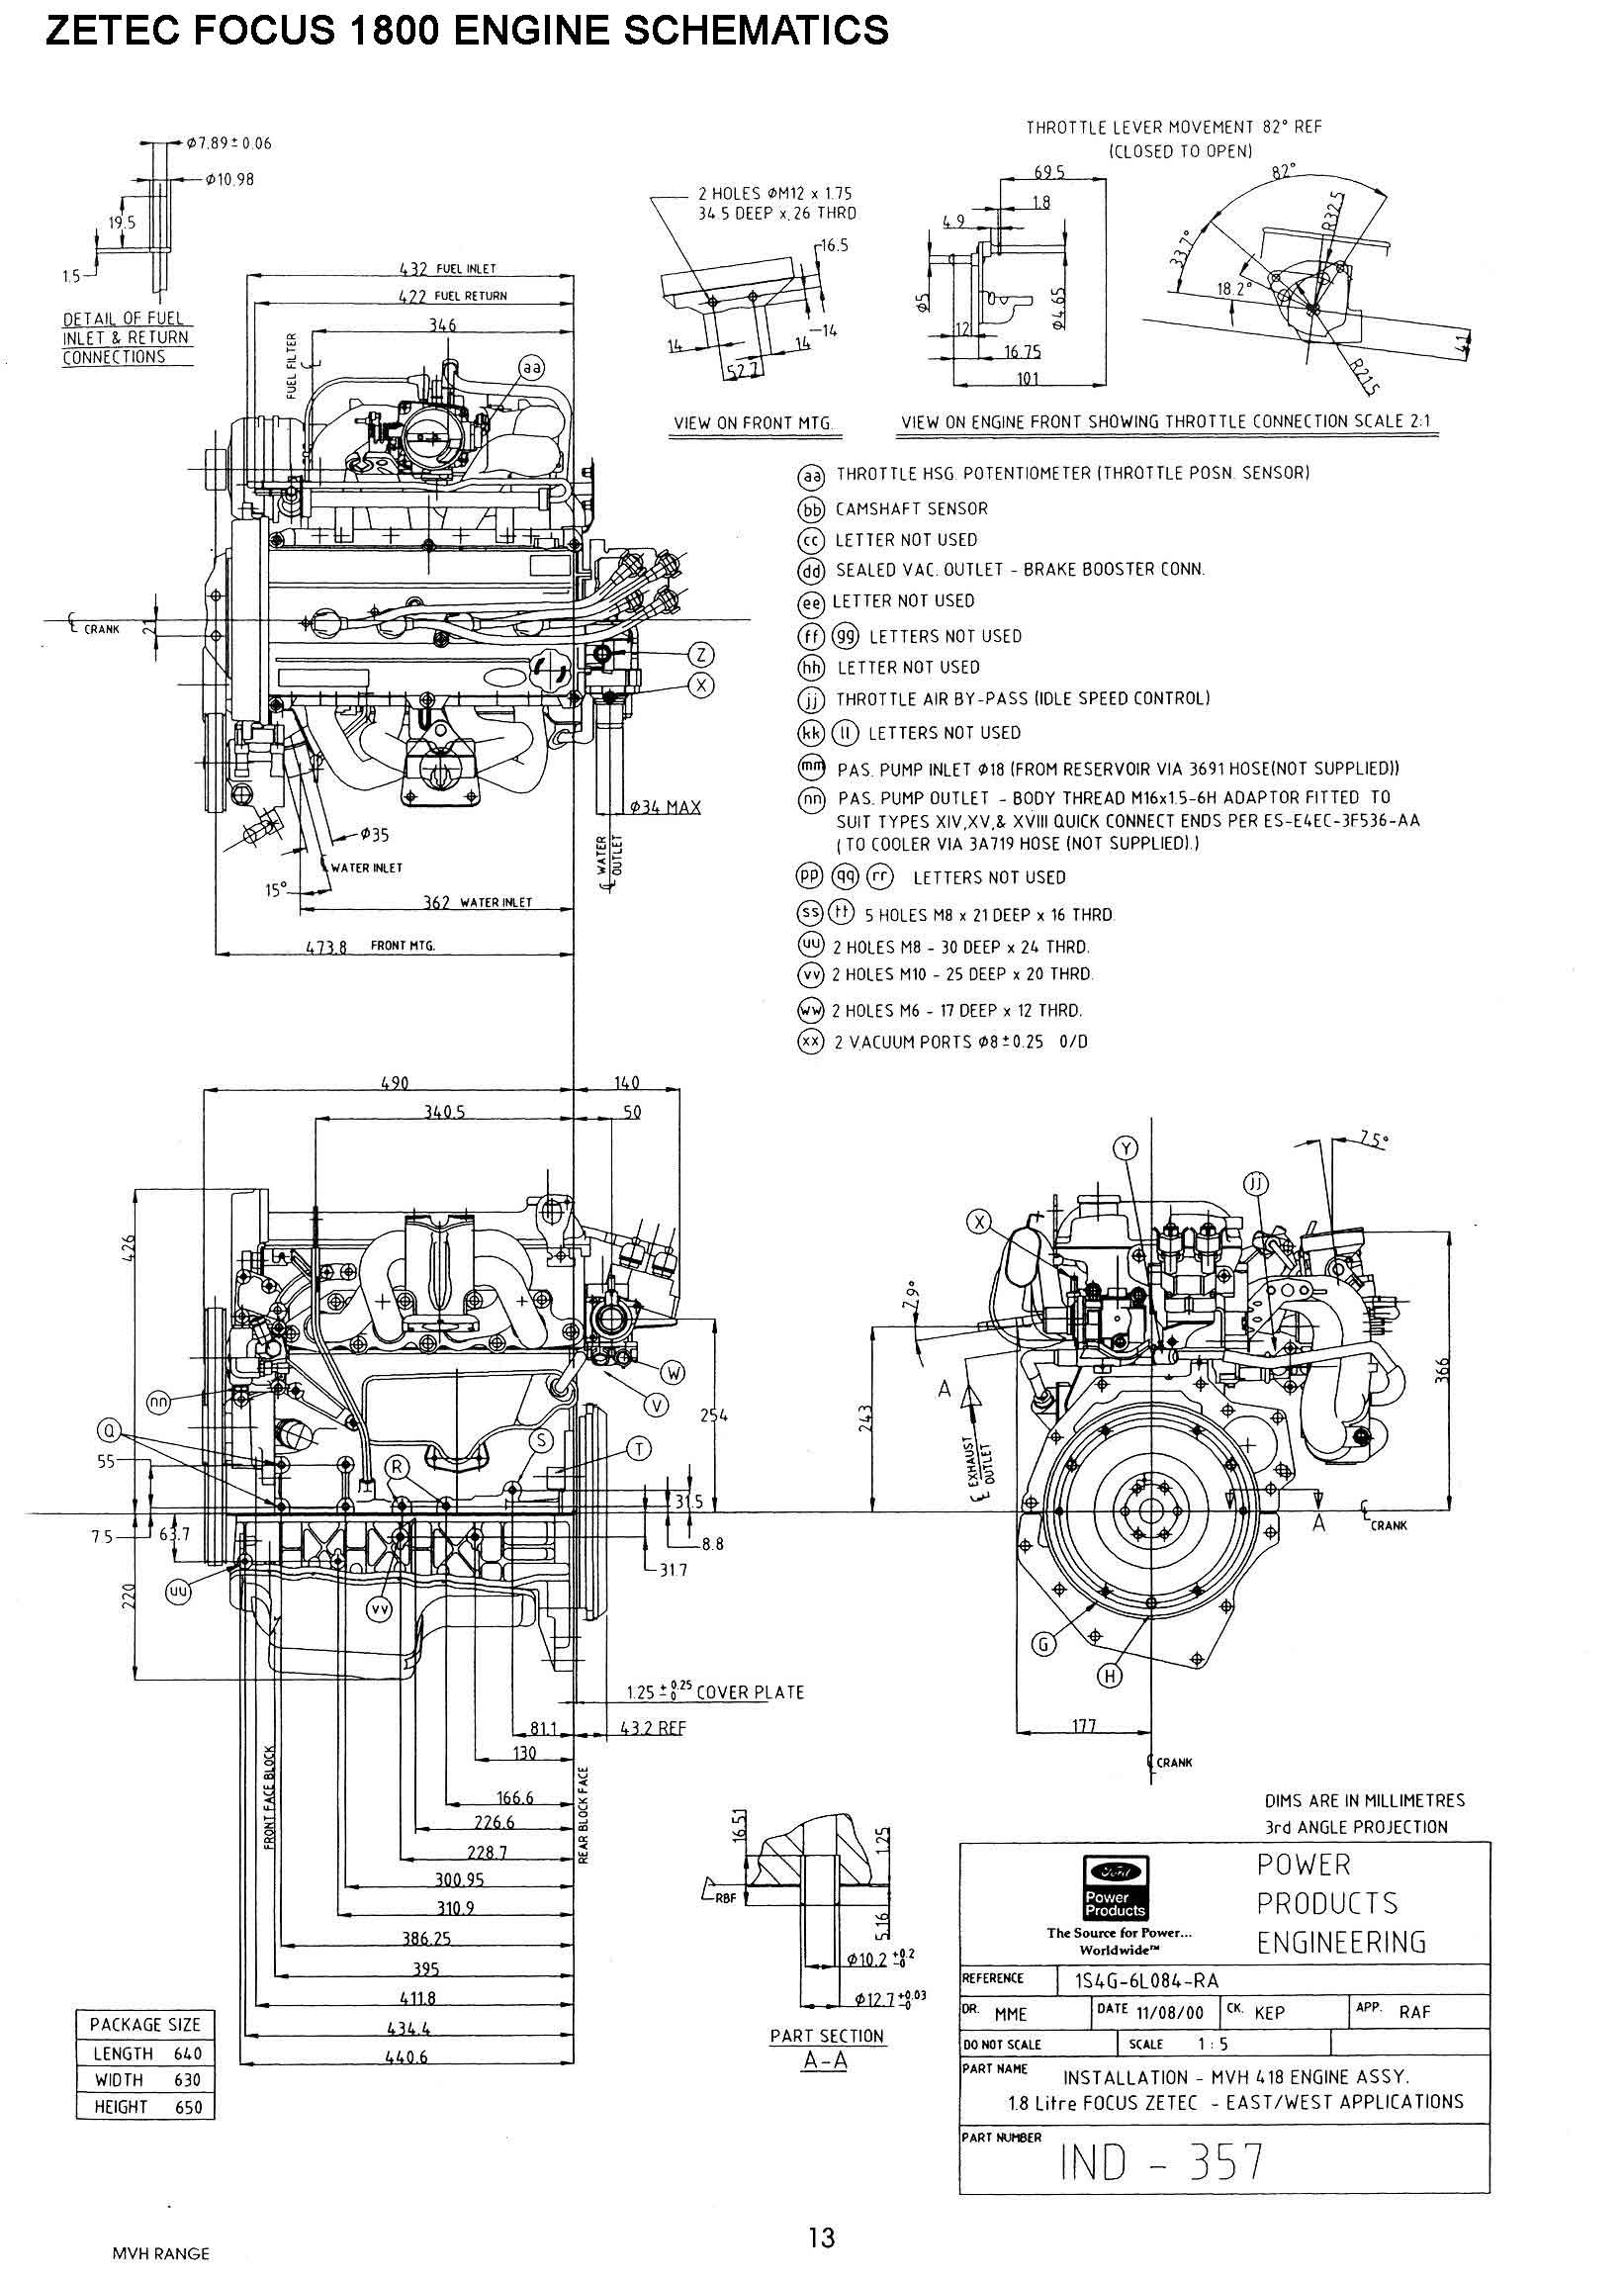 hight resolution of zetec engine diagram wiring diagram paper ford focus zetec engine diagram ford zetec engine diagram